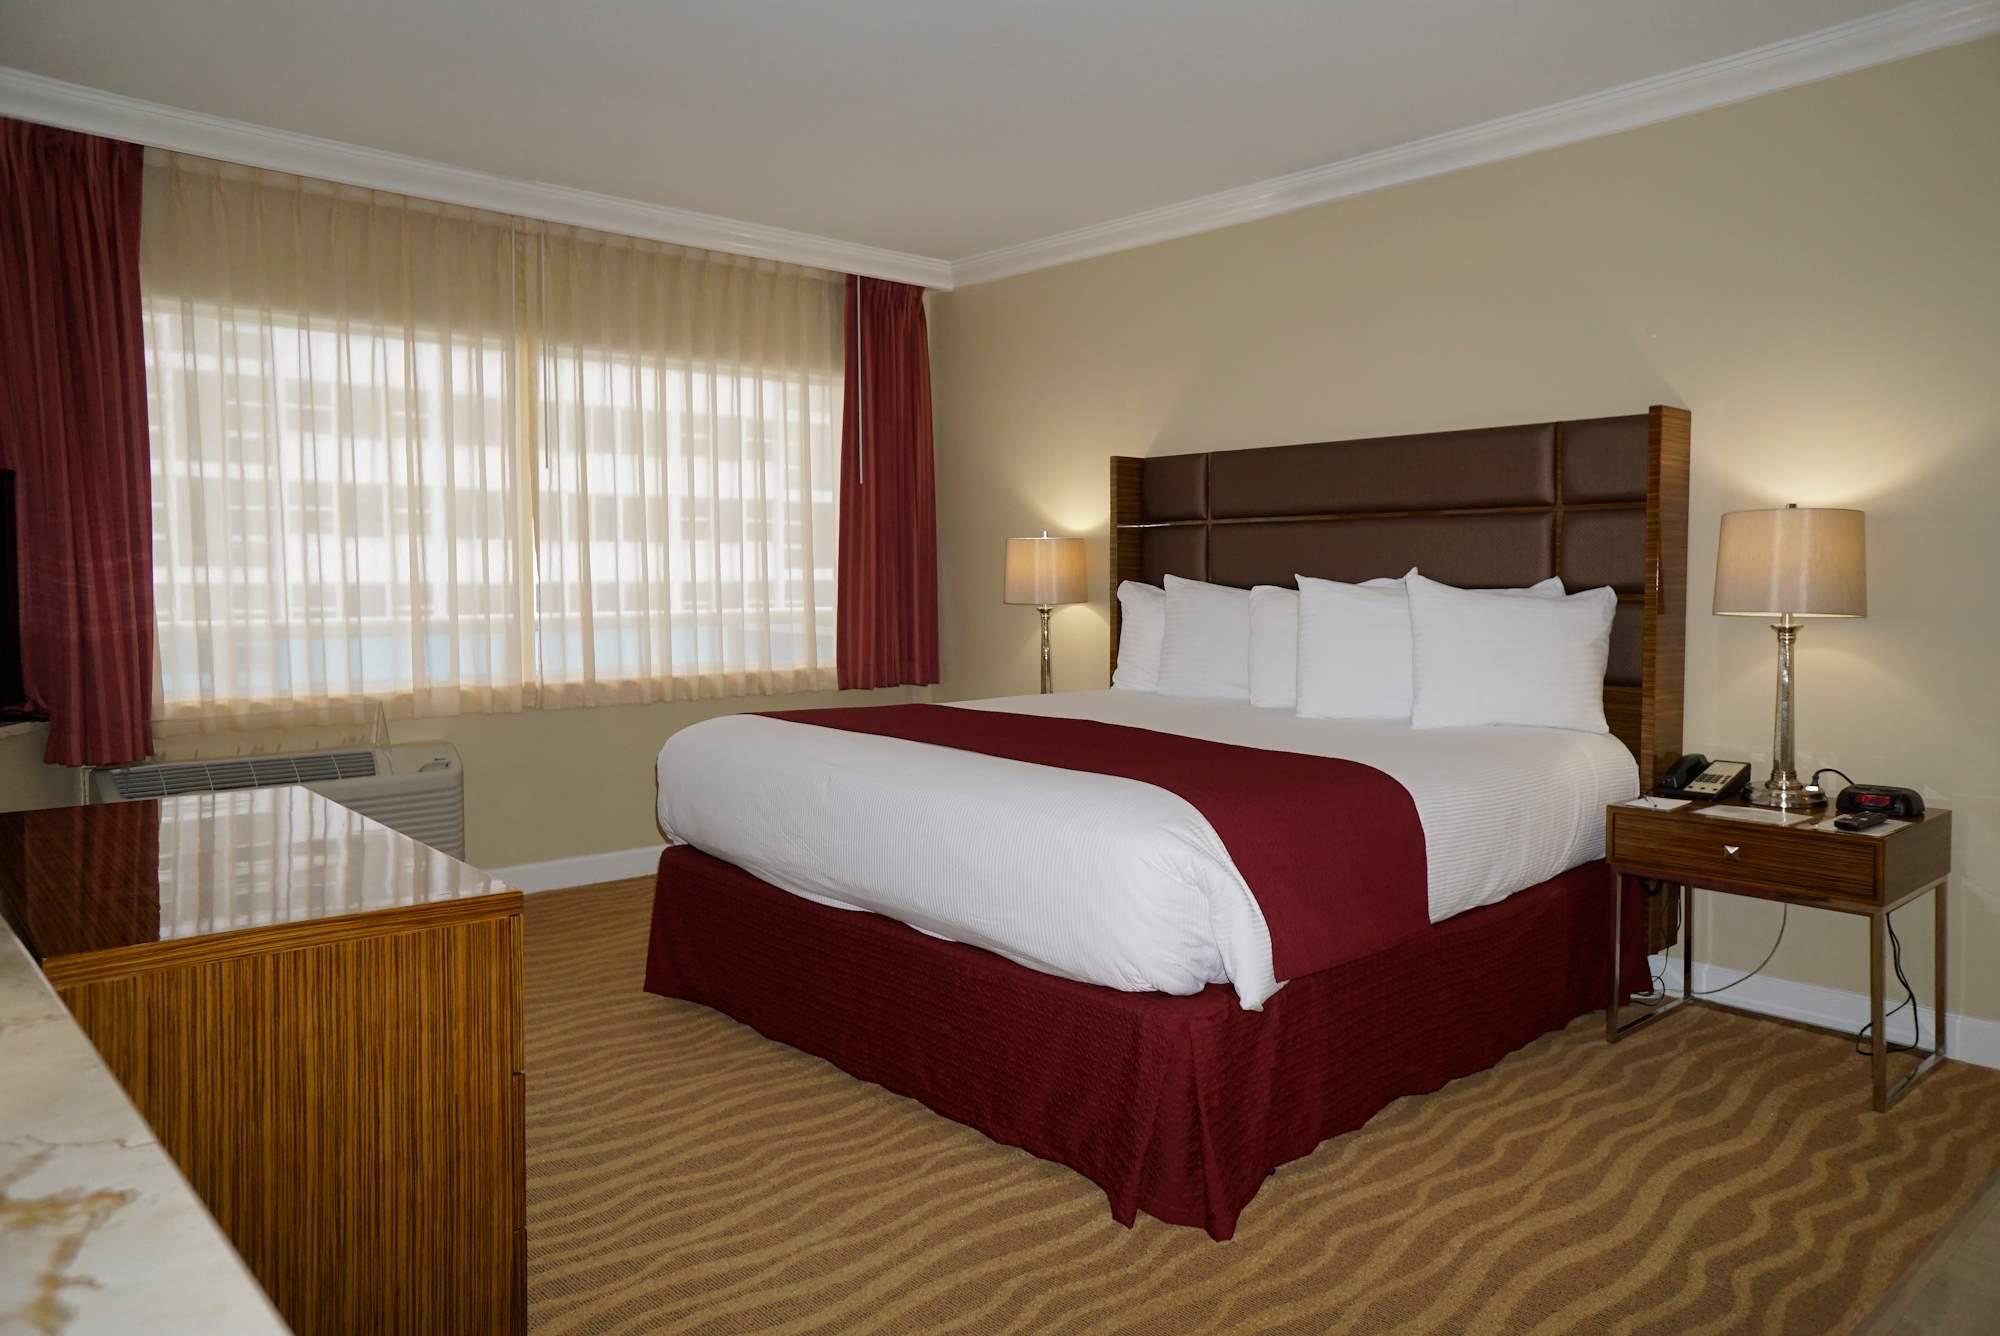 Ocean Sky Hotel- Suite King Bedroom